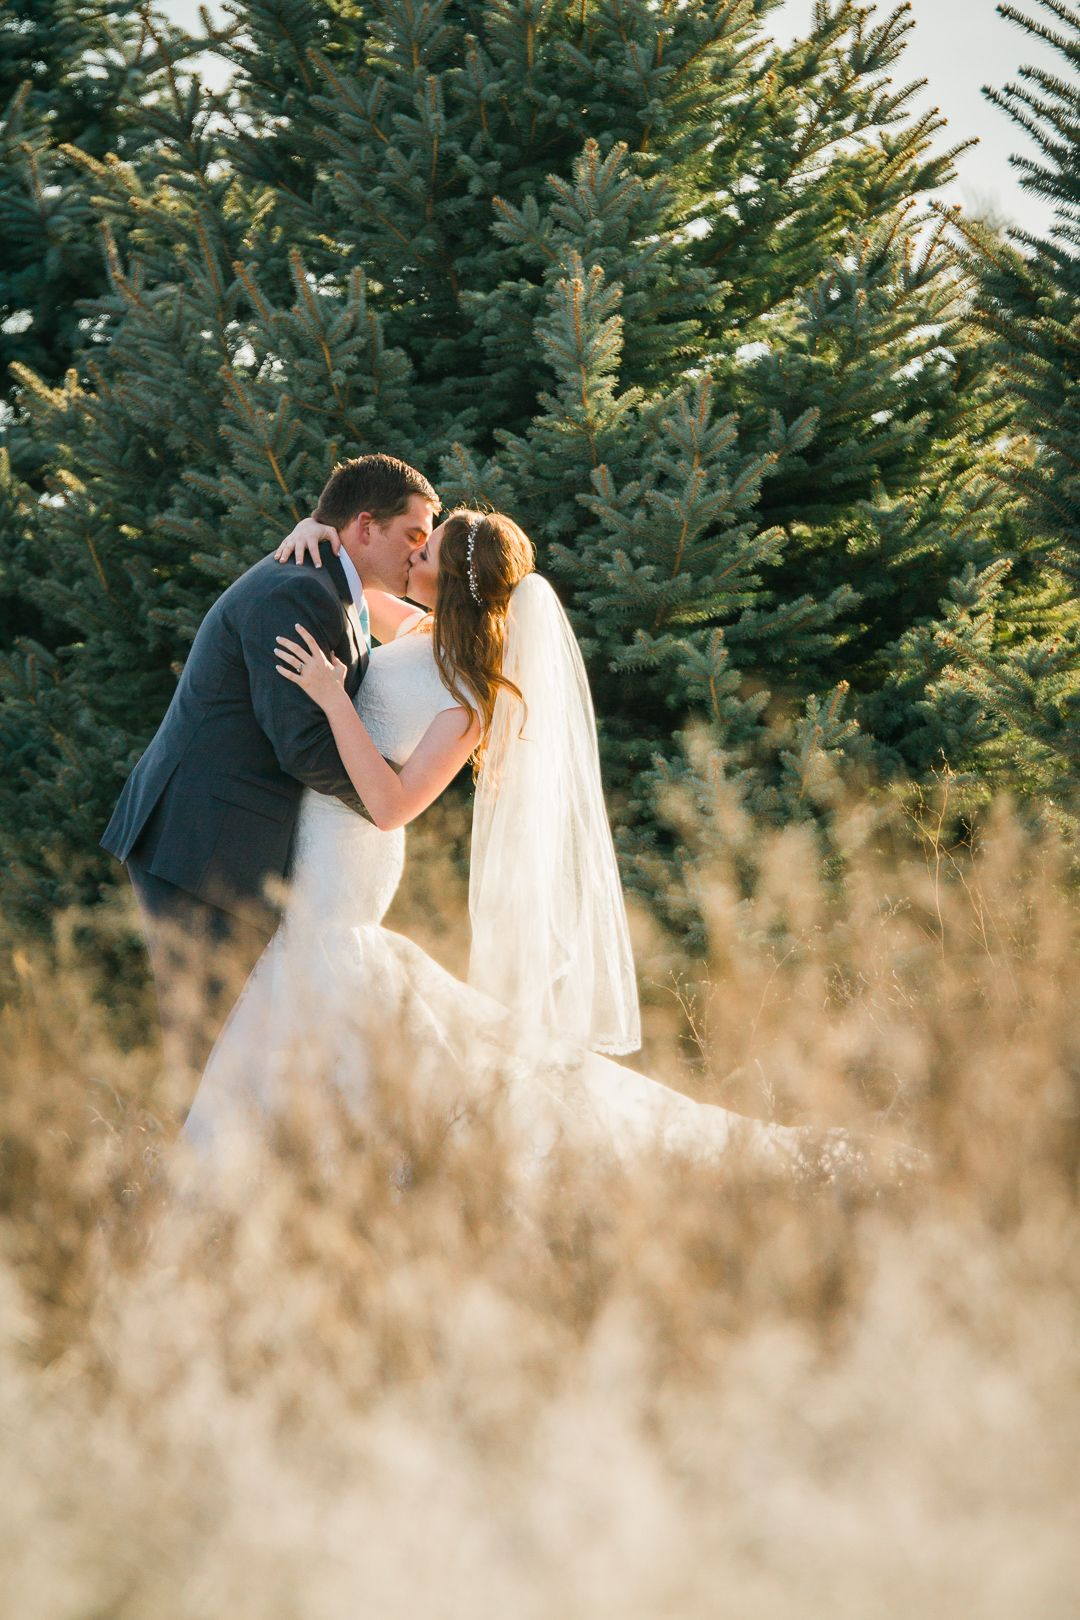 KendraSuePhotography | Weddings, winter wedding, Idaho, Idaho Falls, November bridals, wedding photography, SEI, Utah- Idaho Wedding Photographer